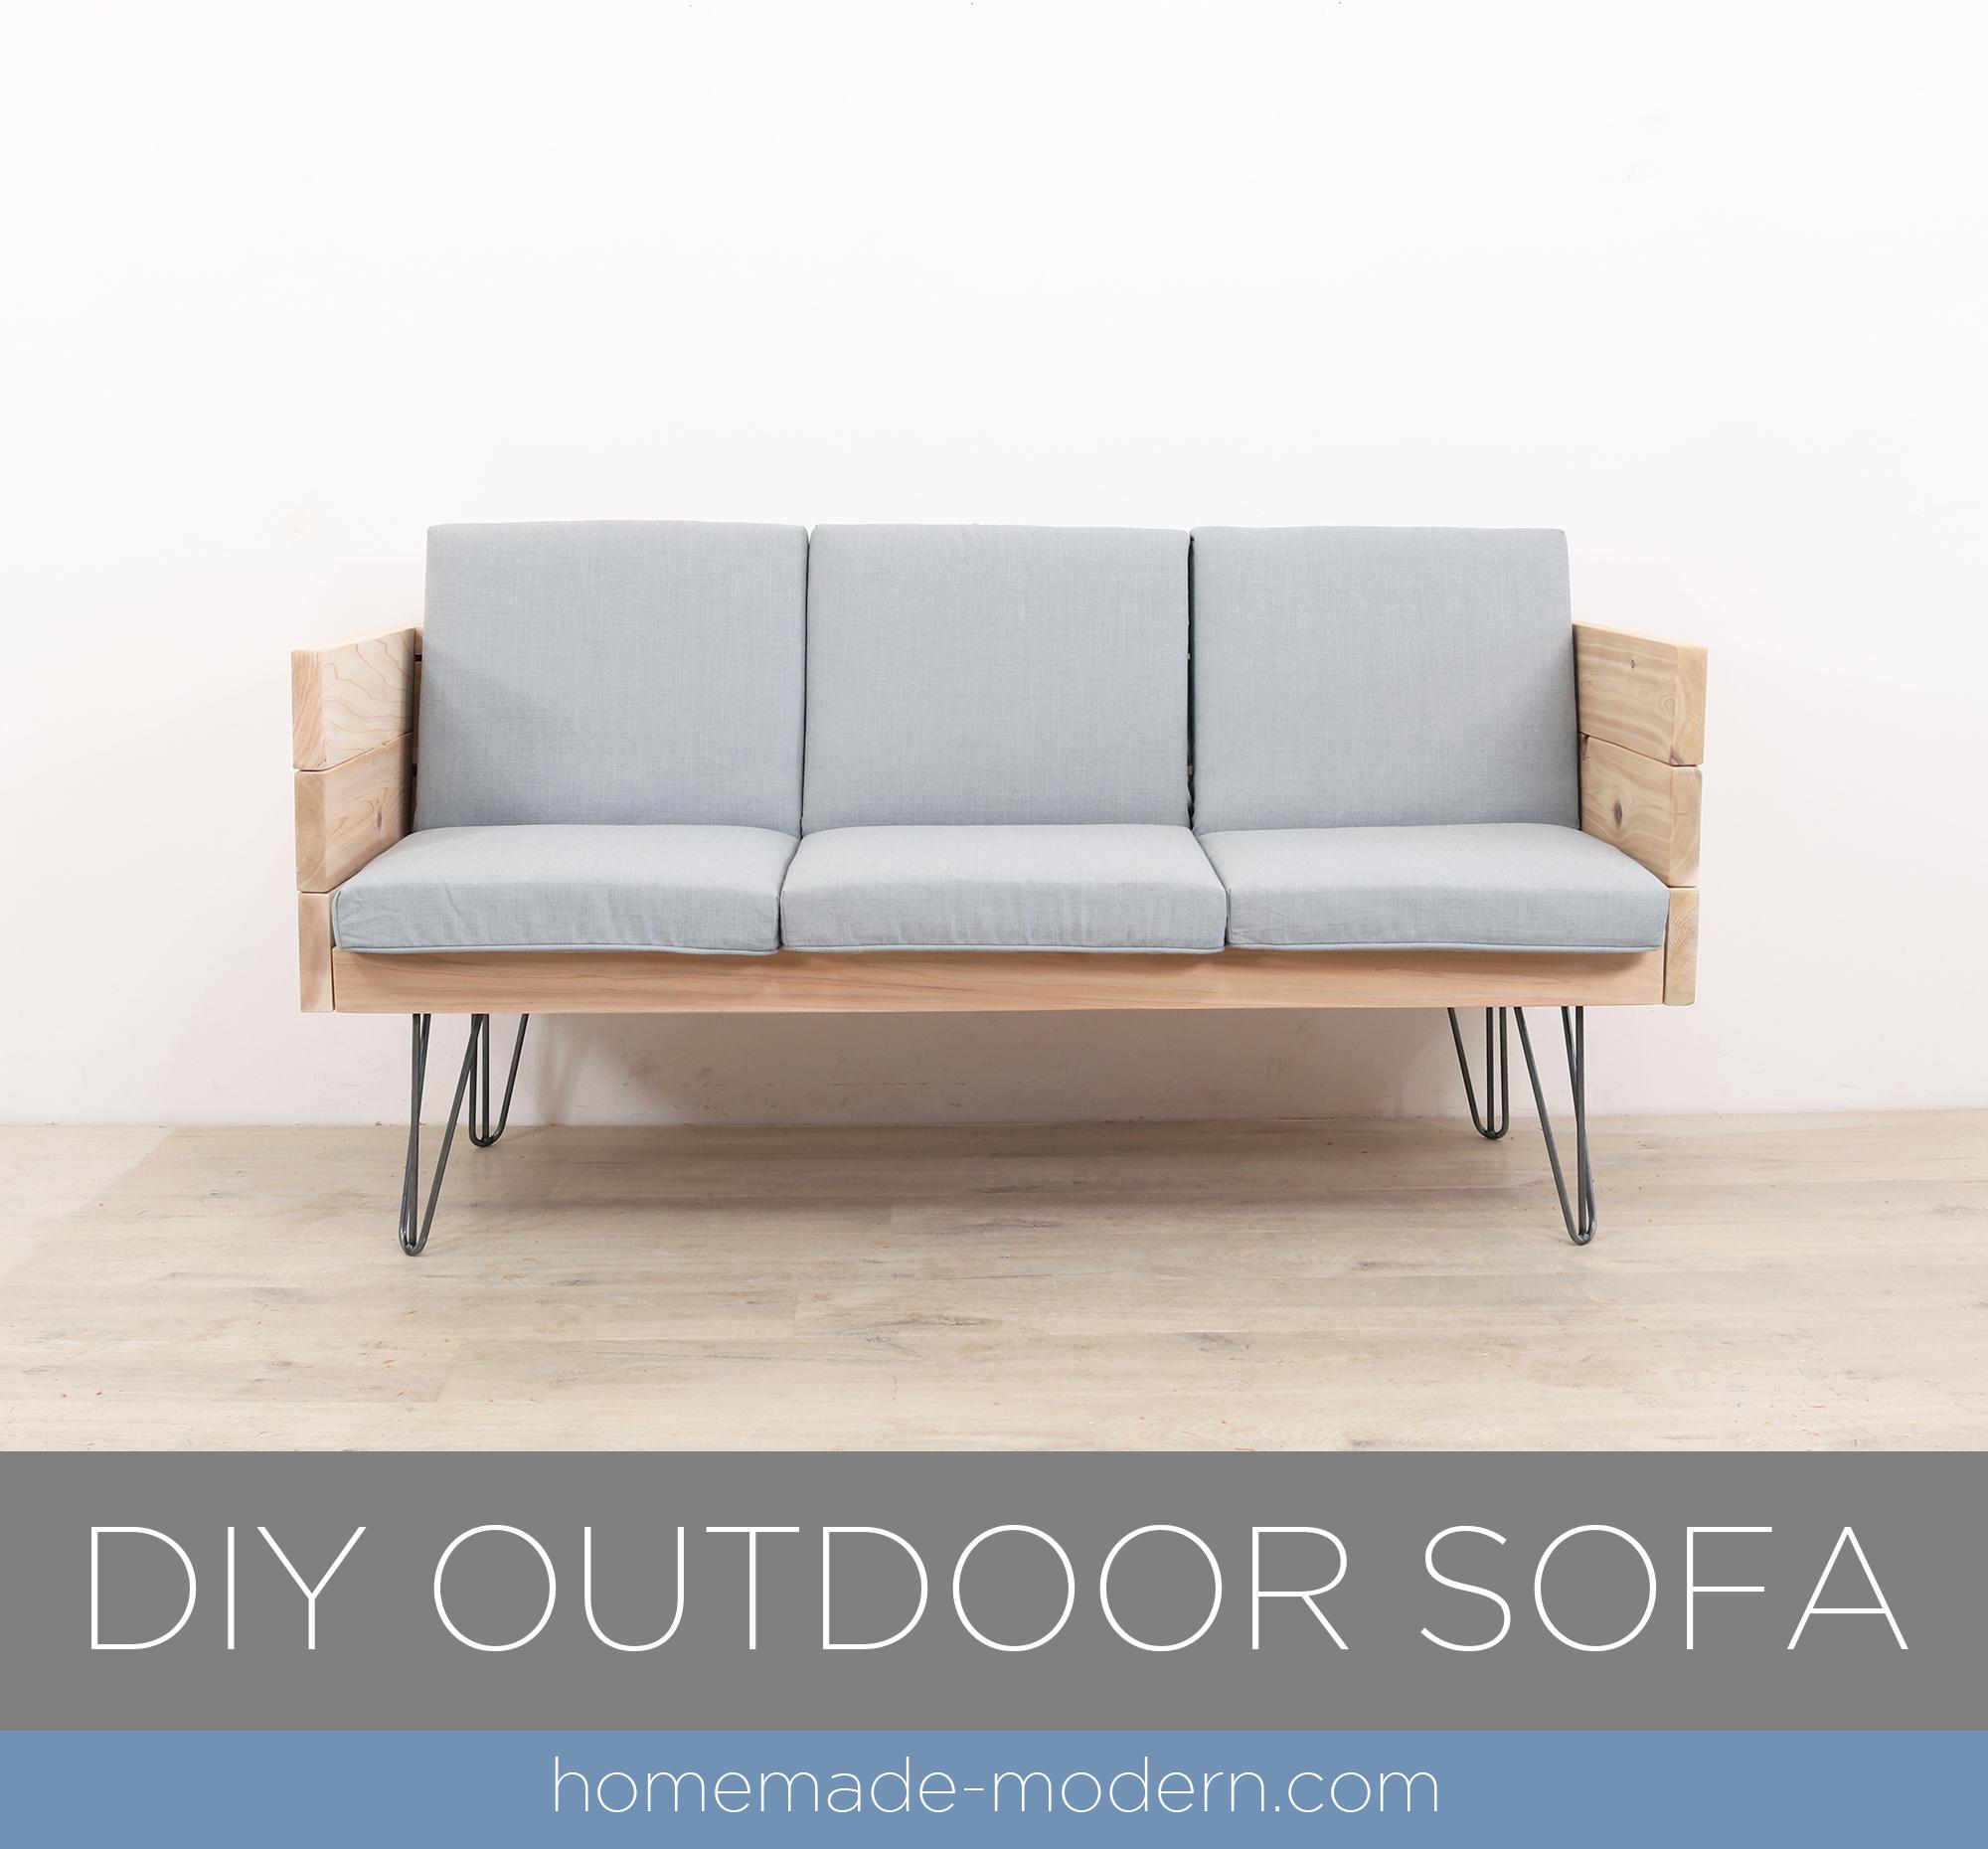 Http Www Homemade Modern Com Wp Content Uploads 2019 04 Outdoorsofa2 Banner Png Diy Patio Furniture Diy Sofa Outdoor Sofa